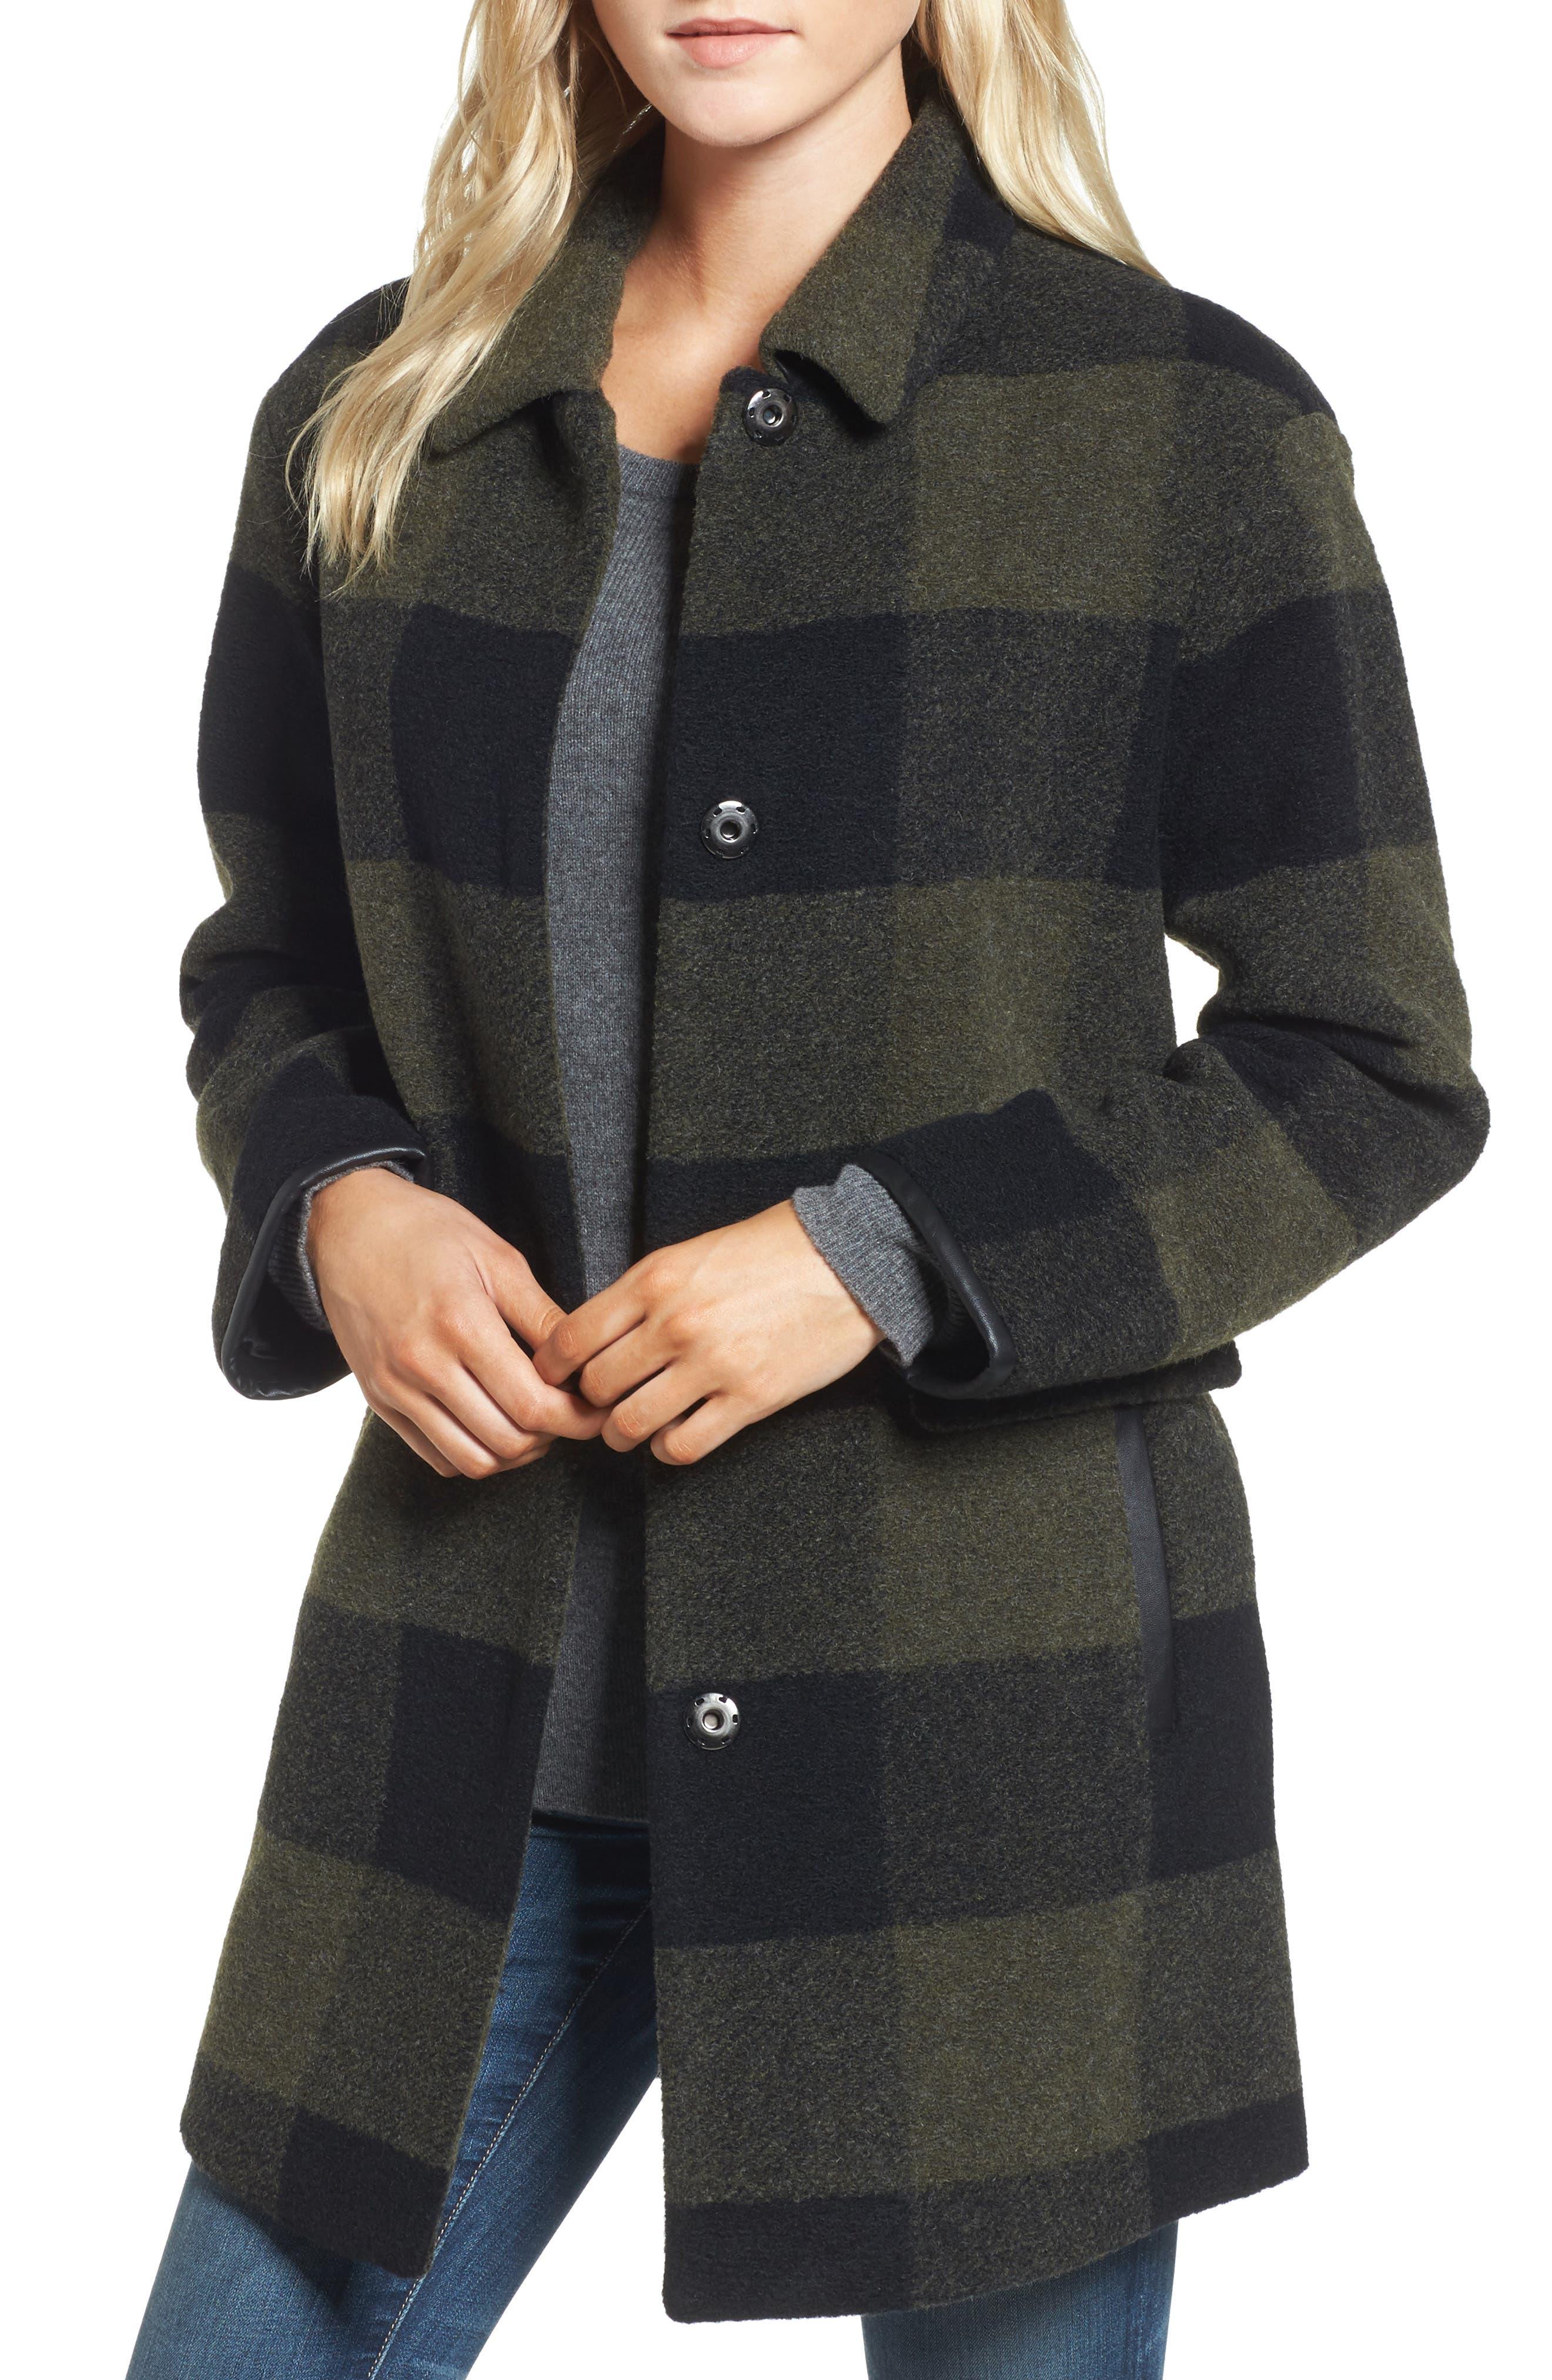 Main Image - Pendleton Paul Bunyan Plaid Wool Blend Barn Coat